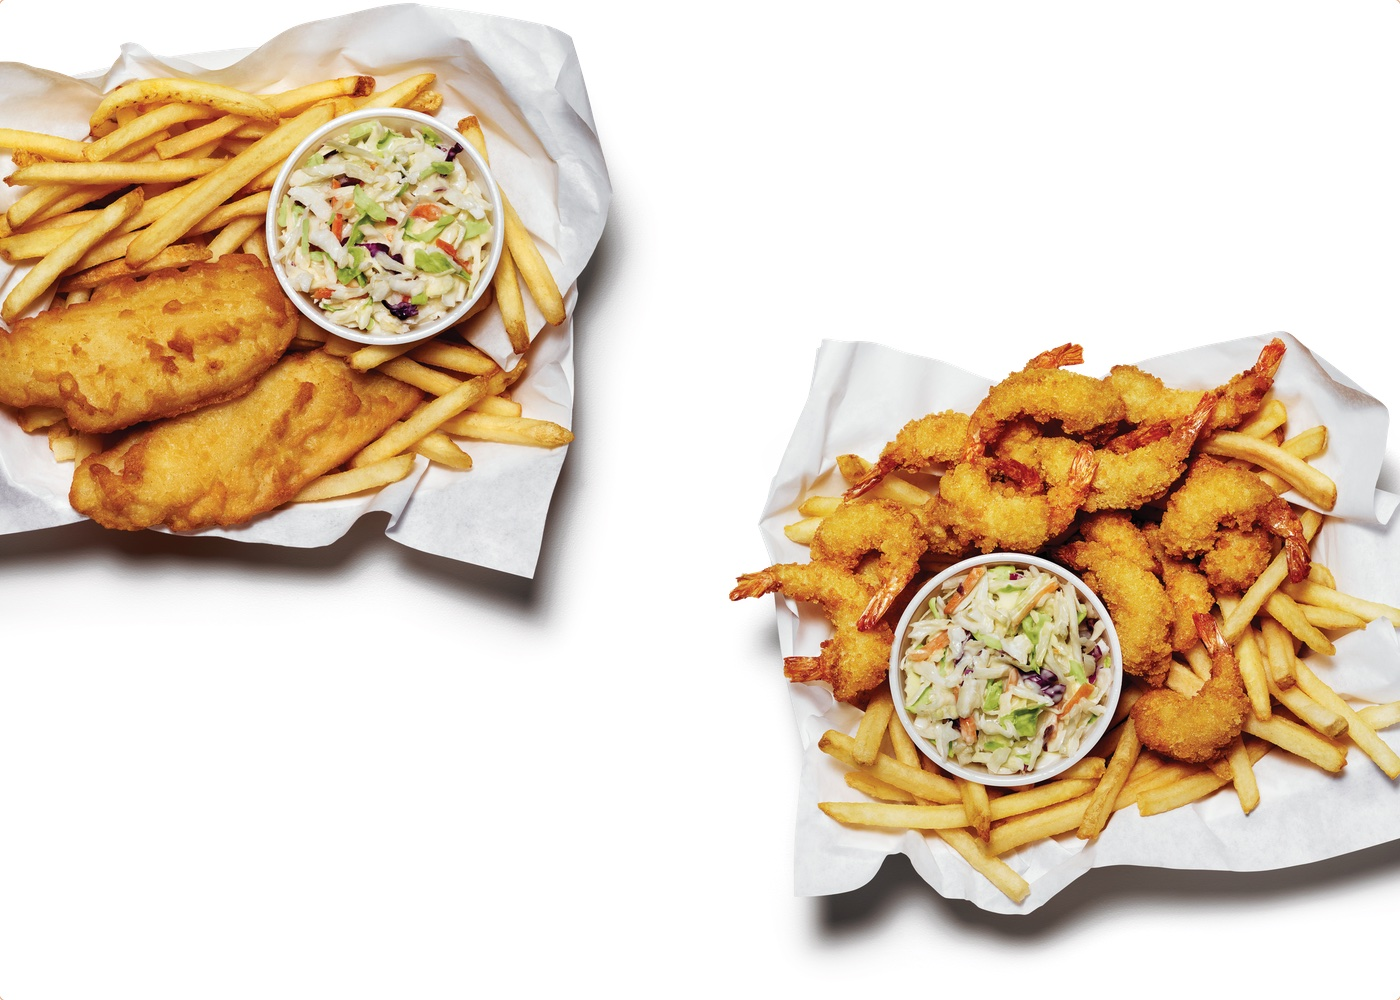 Cod and Shrimp Pub Style Baskets